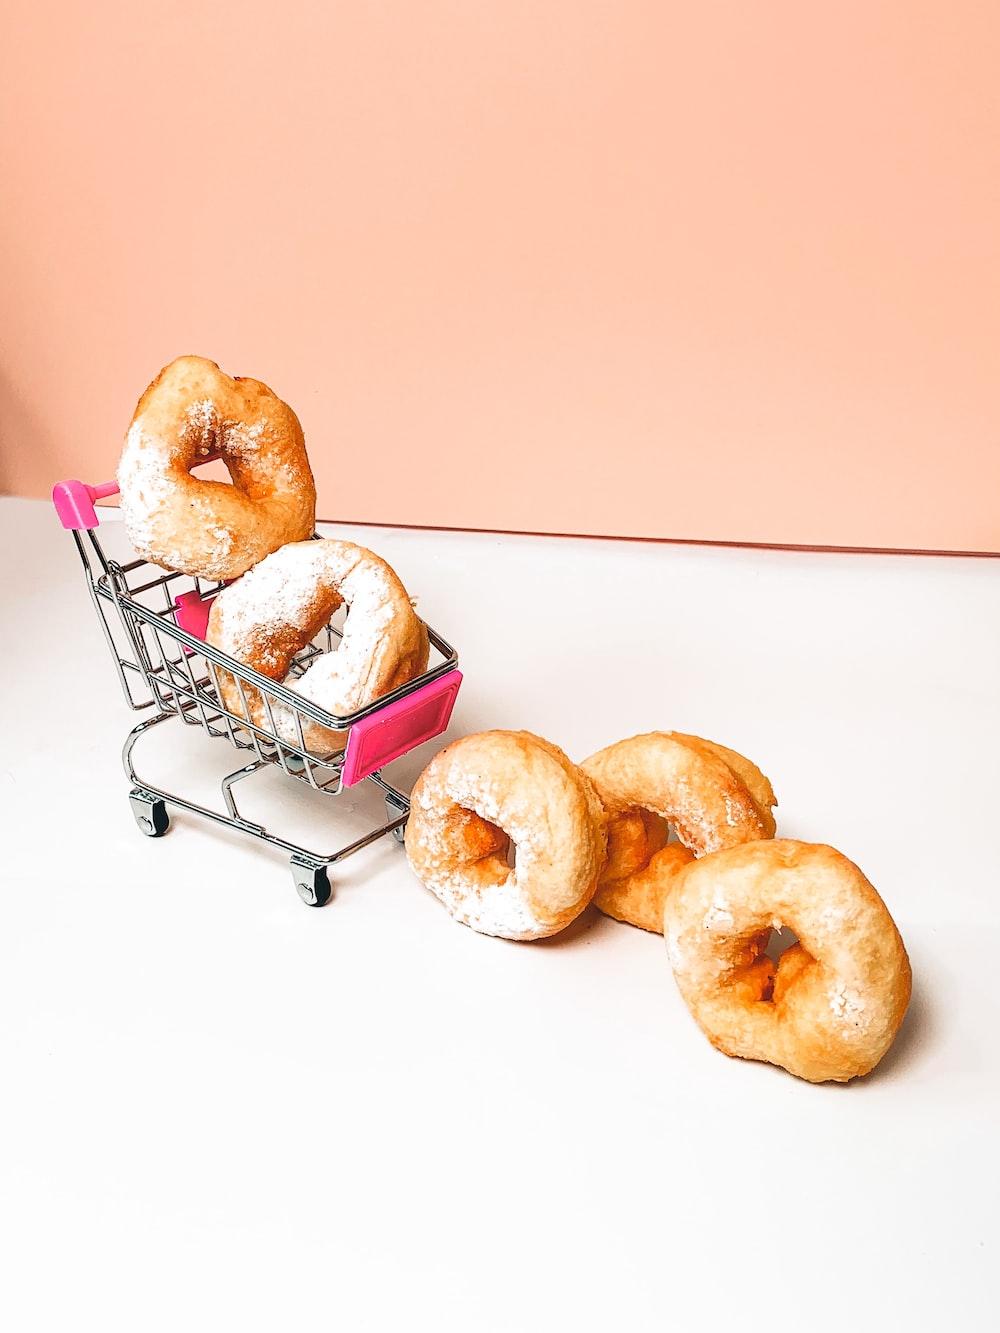 brown donuts on stainless steel rack